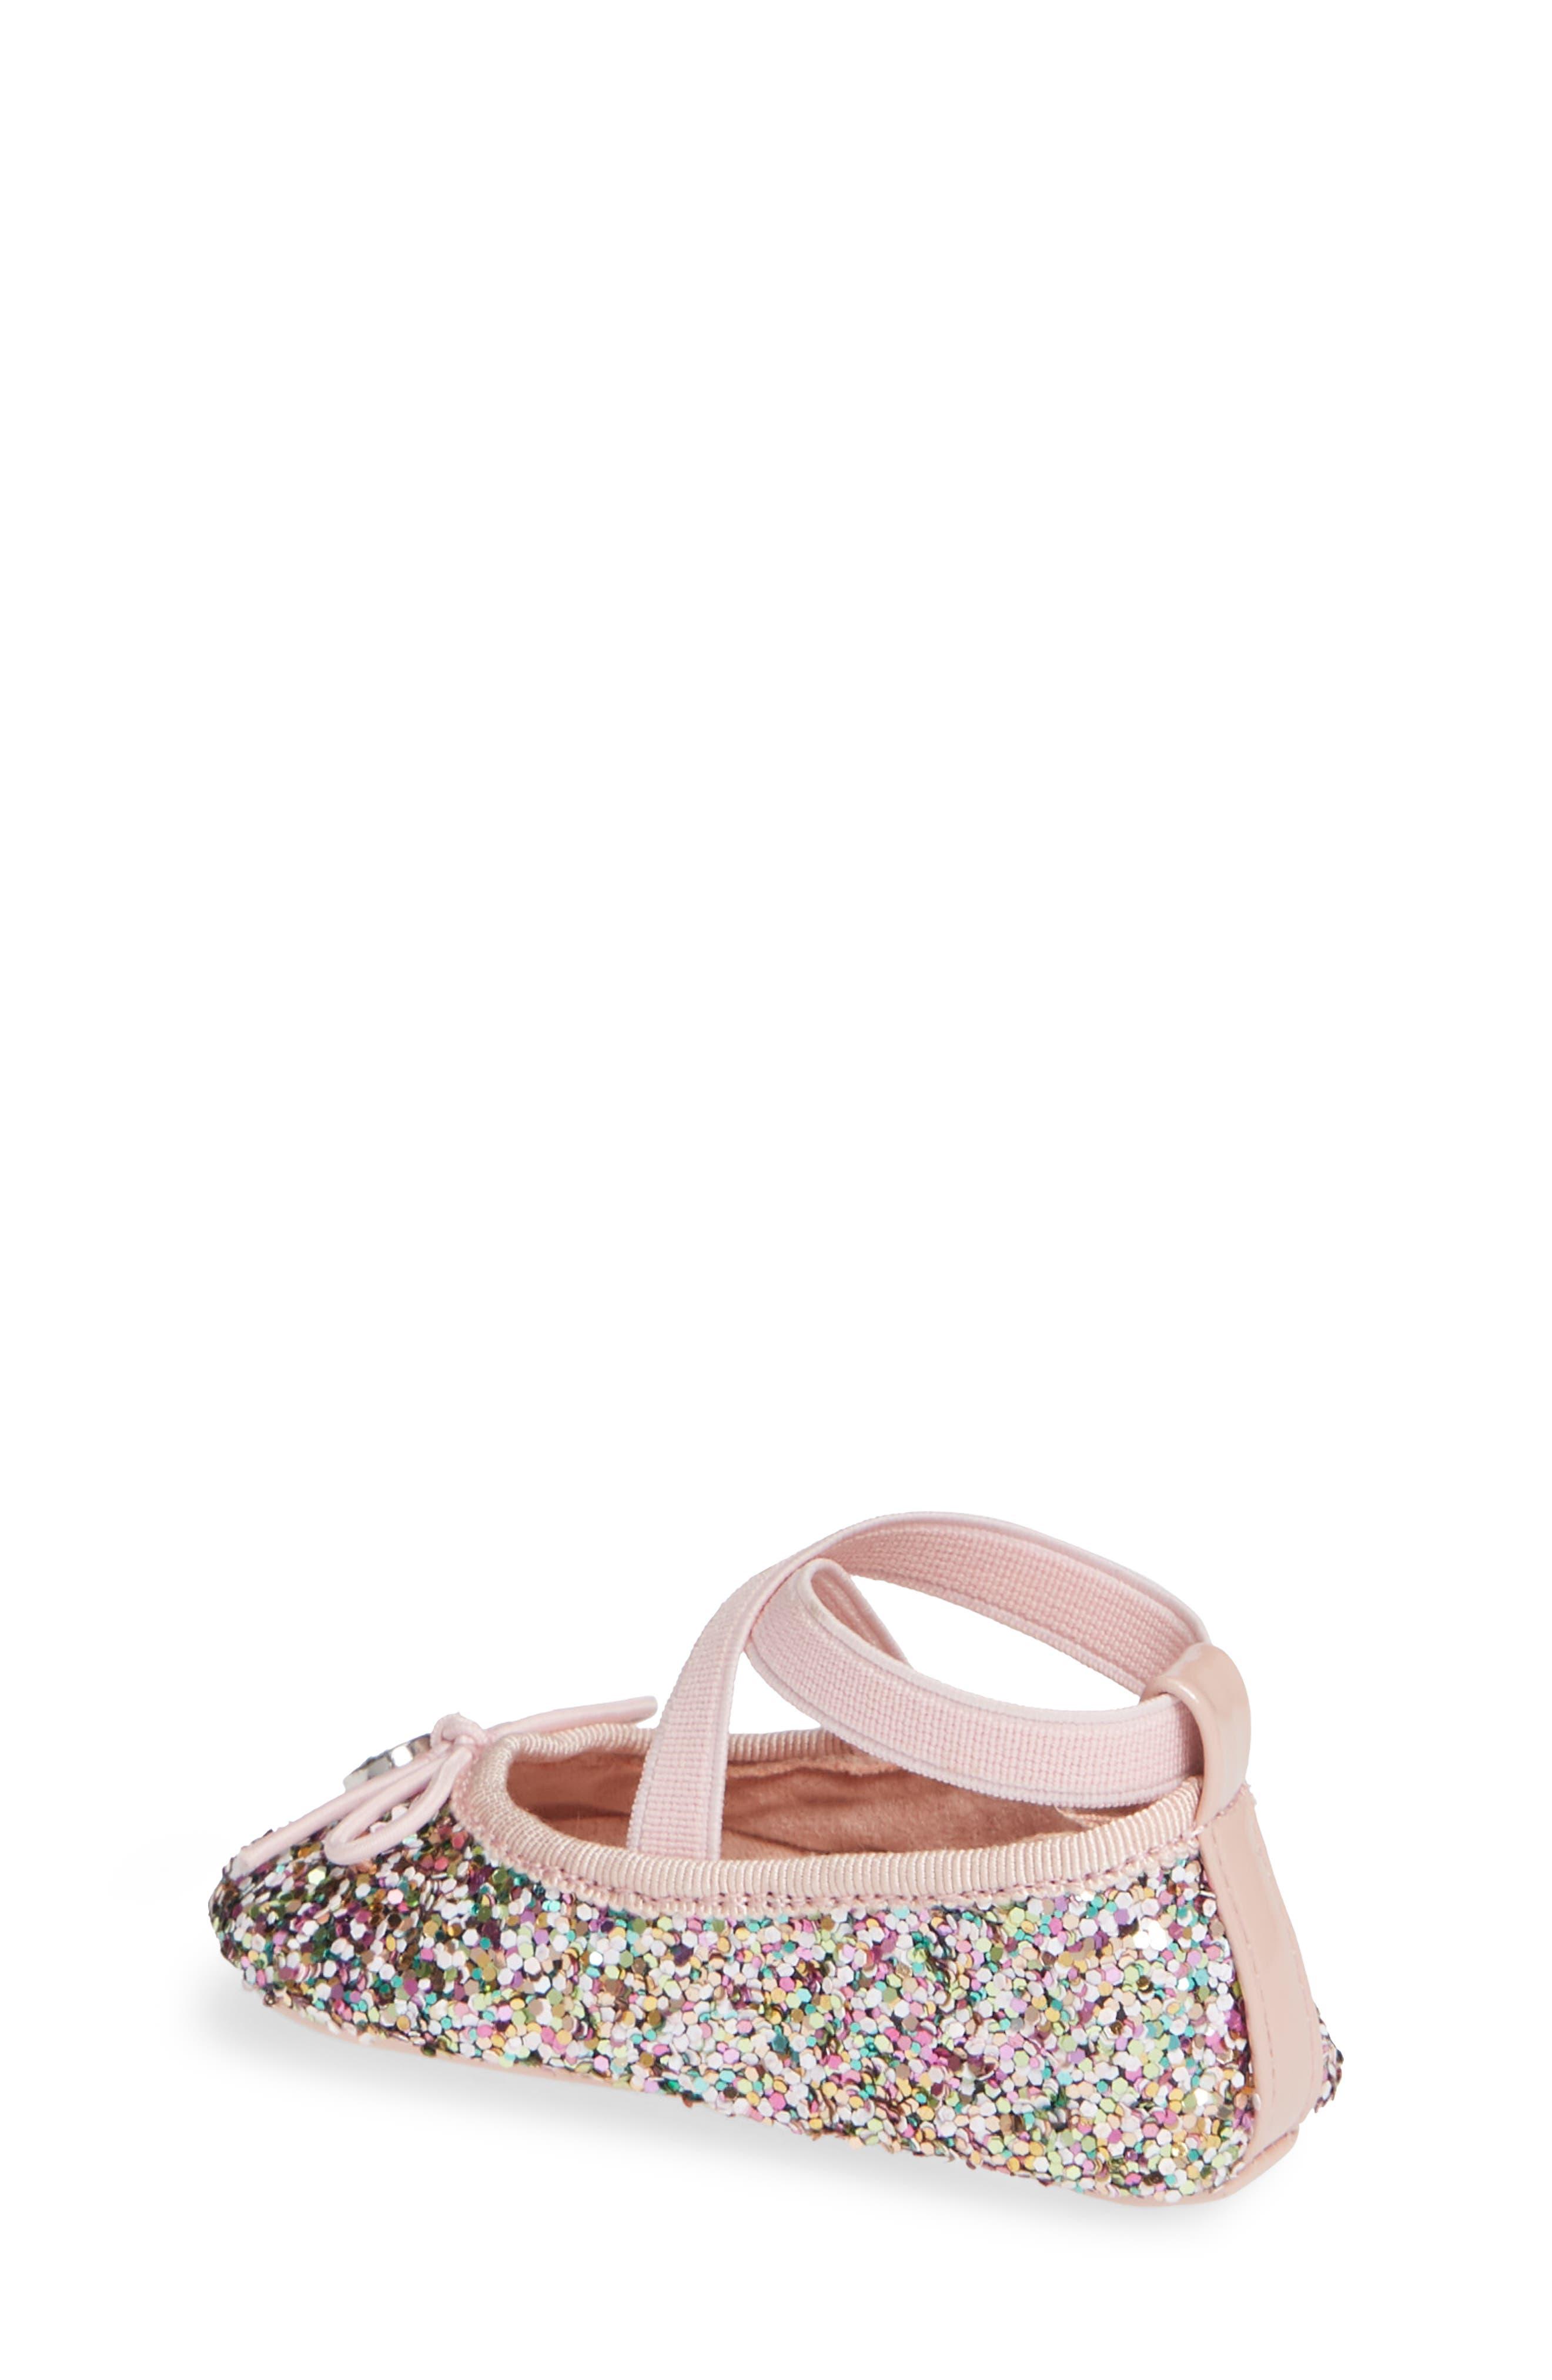 JESSICA SIMPSON, Glitter Mary Jane Crib Shoe, Alternate thumbnail 2, color, 650